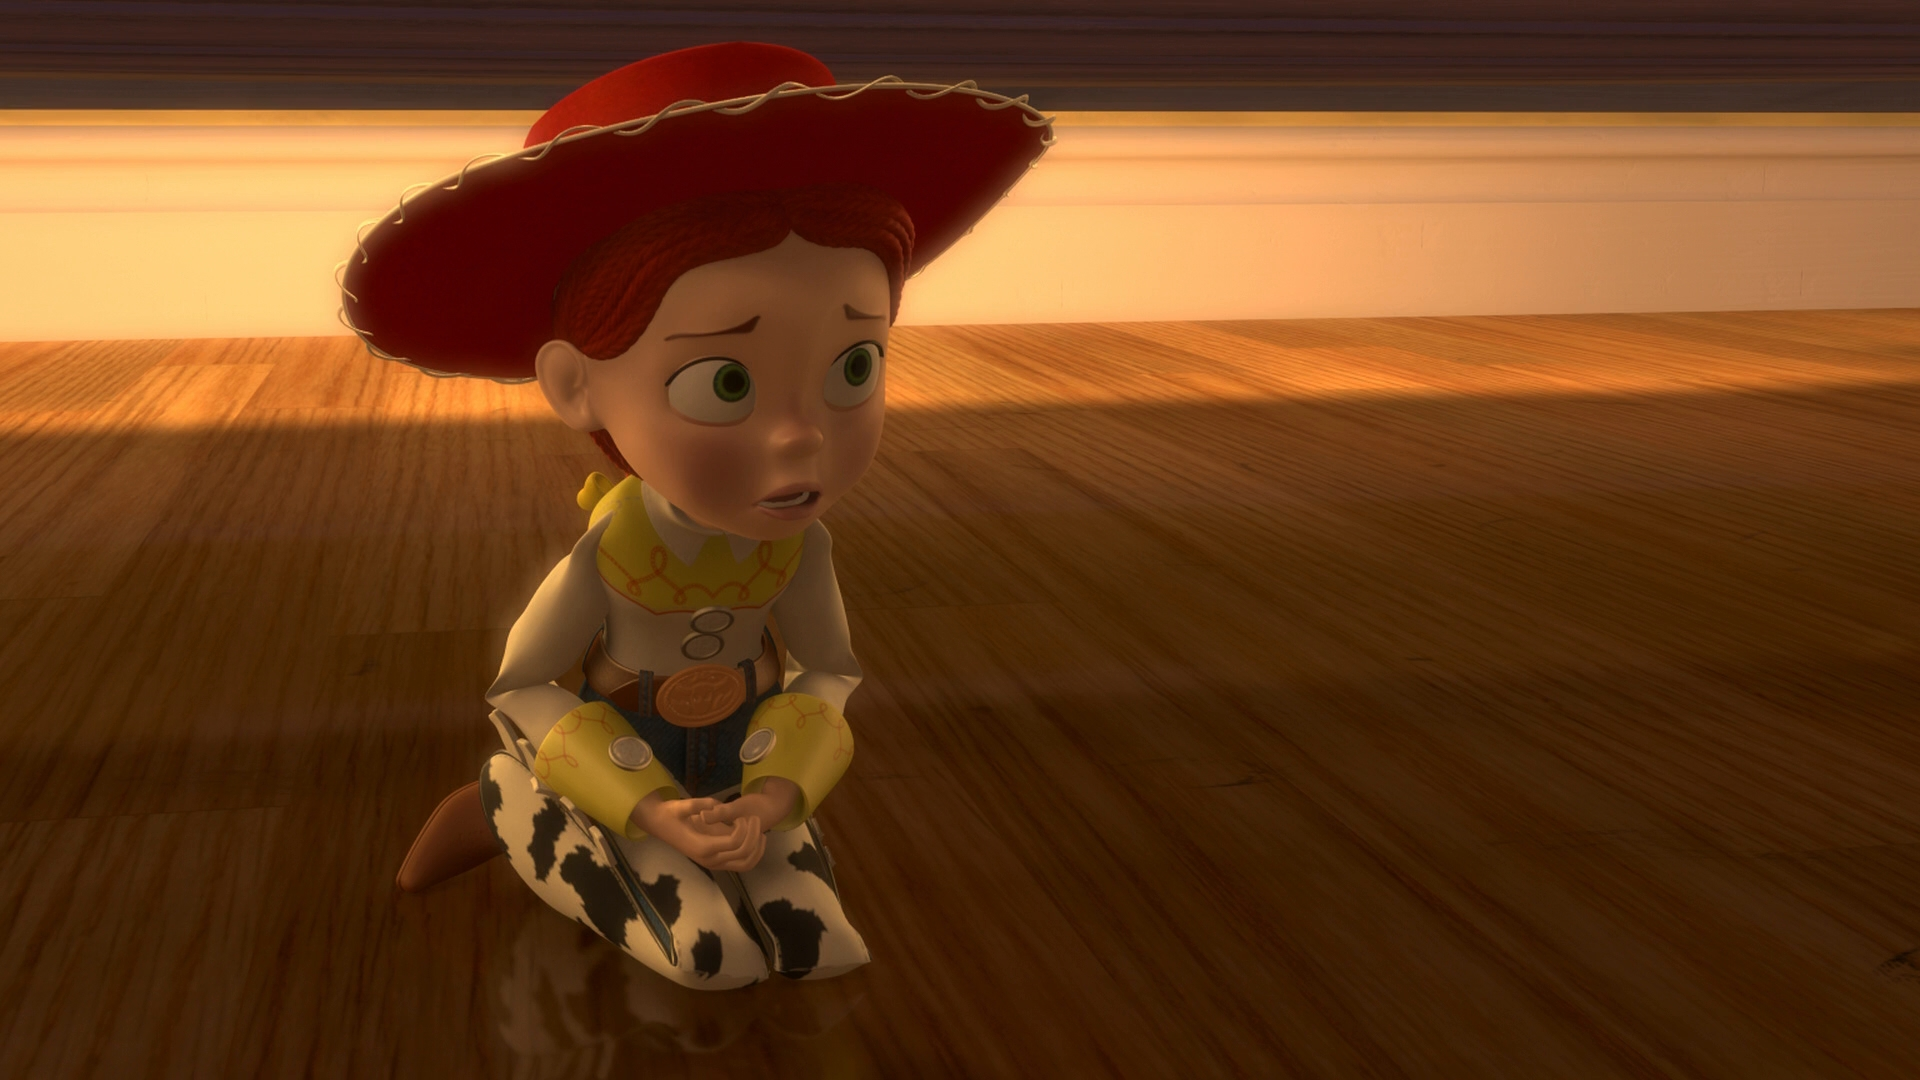 Toy Story Movies Collection 1995-2019 1080p BluRay x264 - LameyHost المجموعة الكاملة مدبلجة للغة العربية تحميل تورنت 5 arabp2p.com